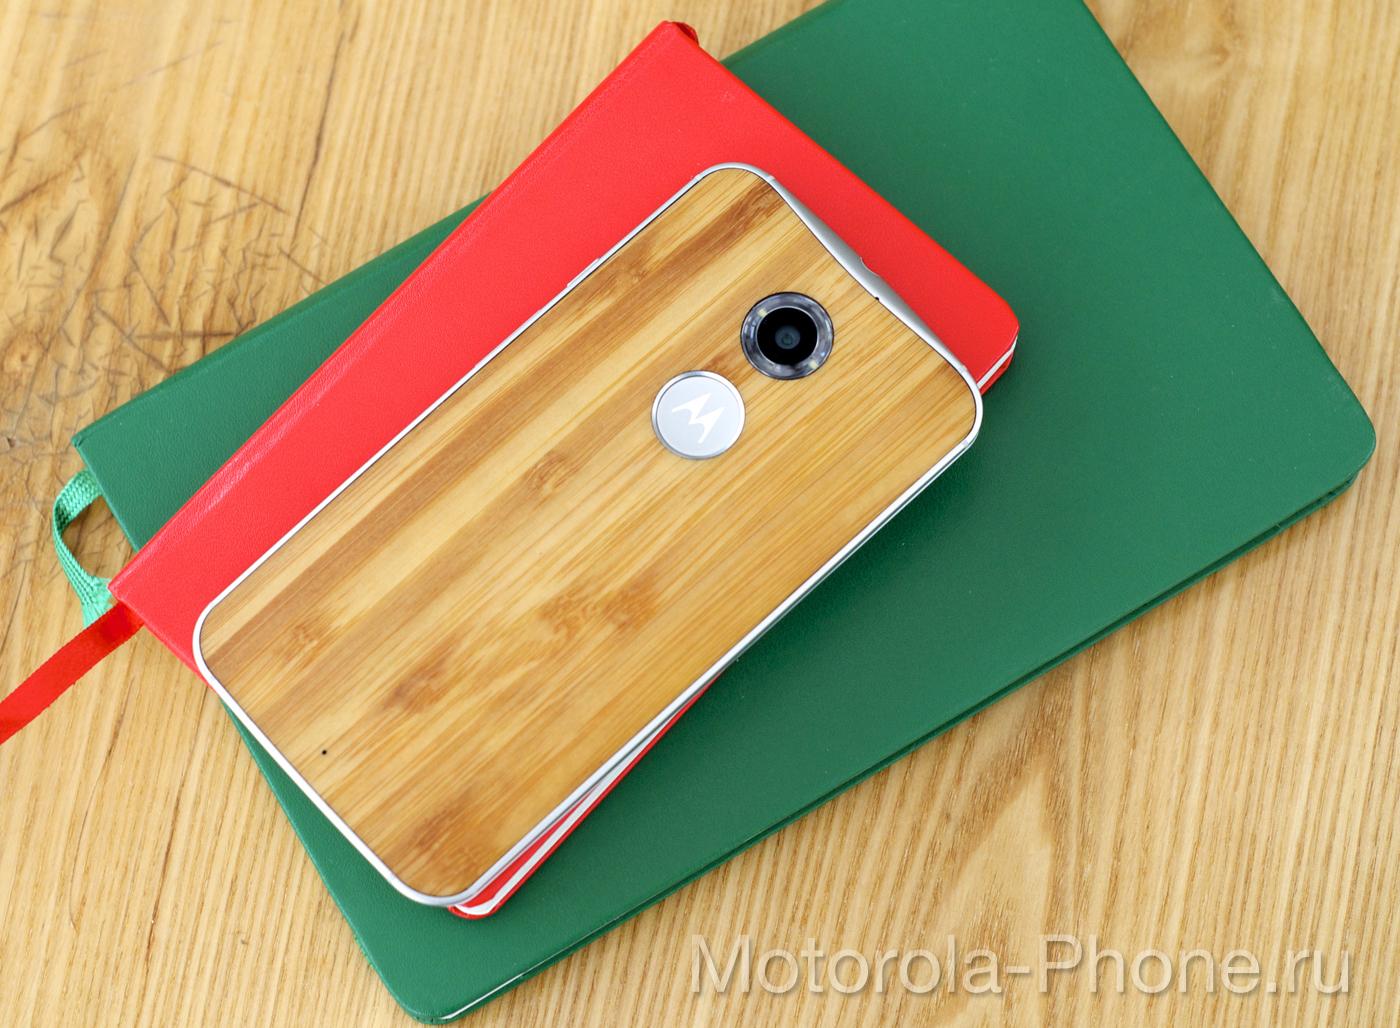 Motorola-Moto-X-Android-5-1